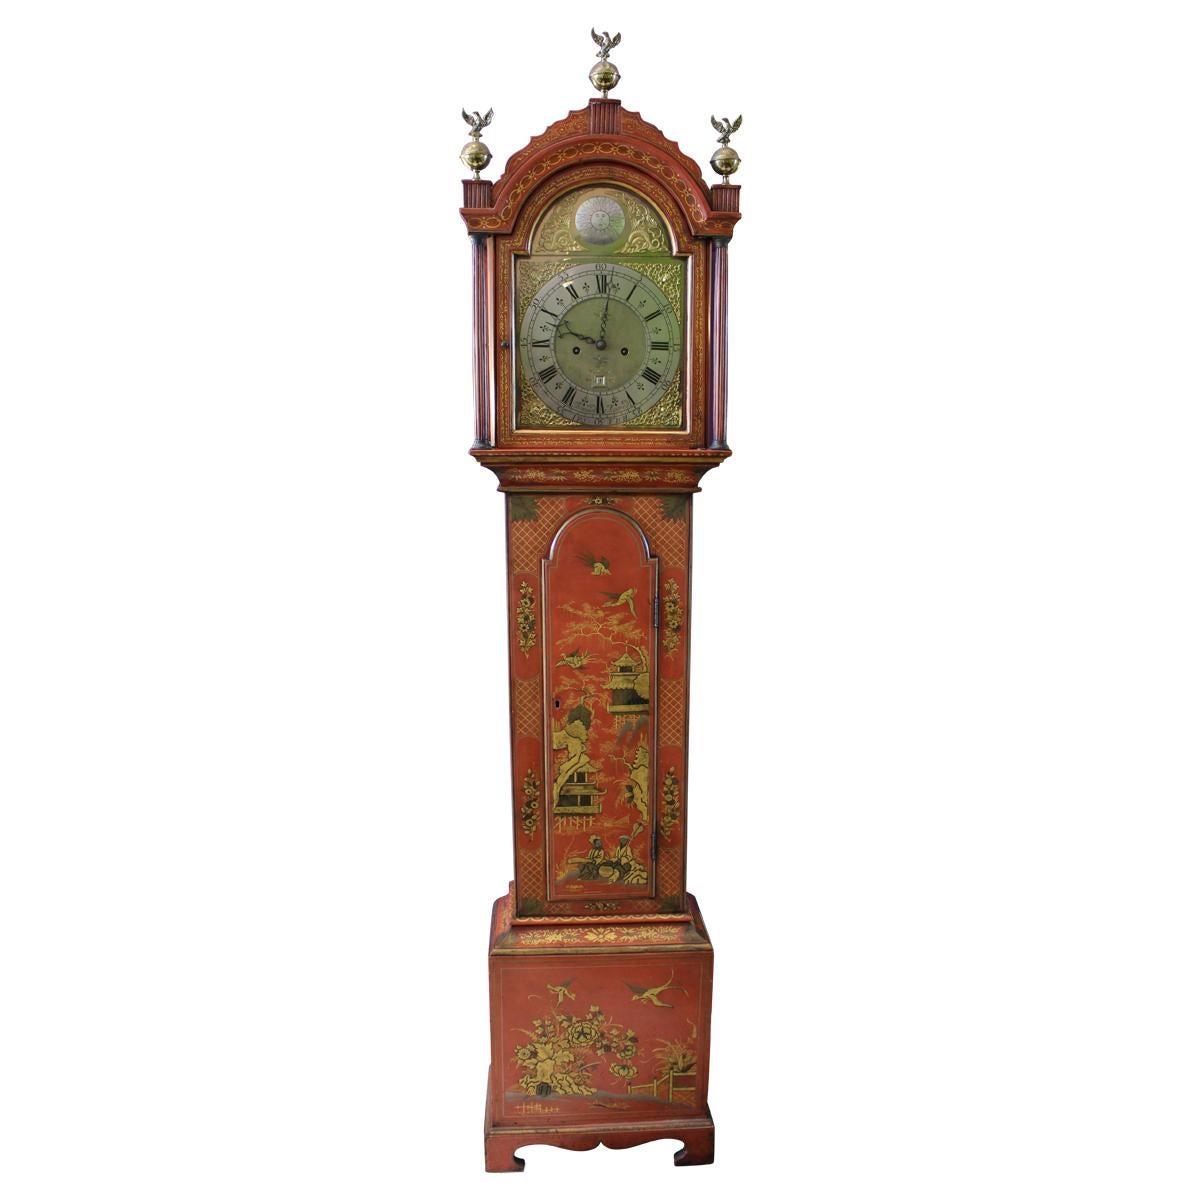 George III Later Scarlet Japanned Long Case Thomas Moore Clock